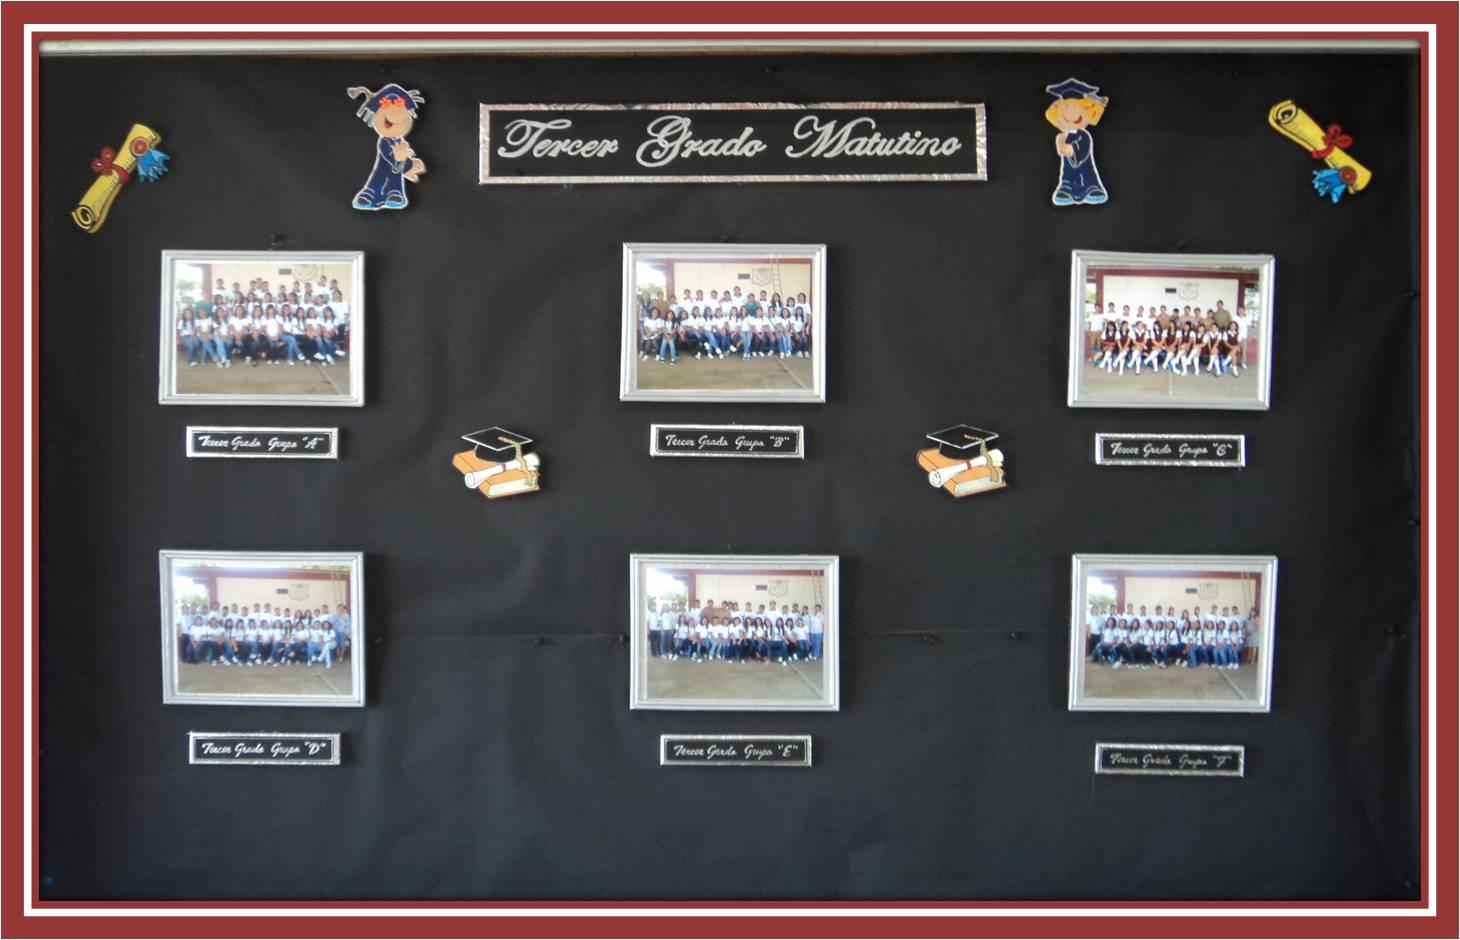 Periodico Mural Graduacion Primaria